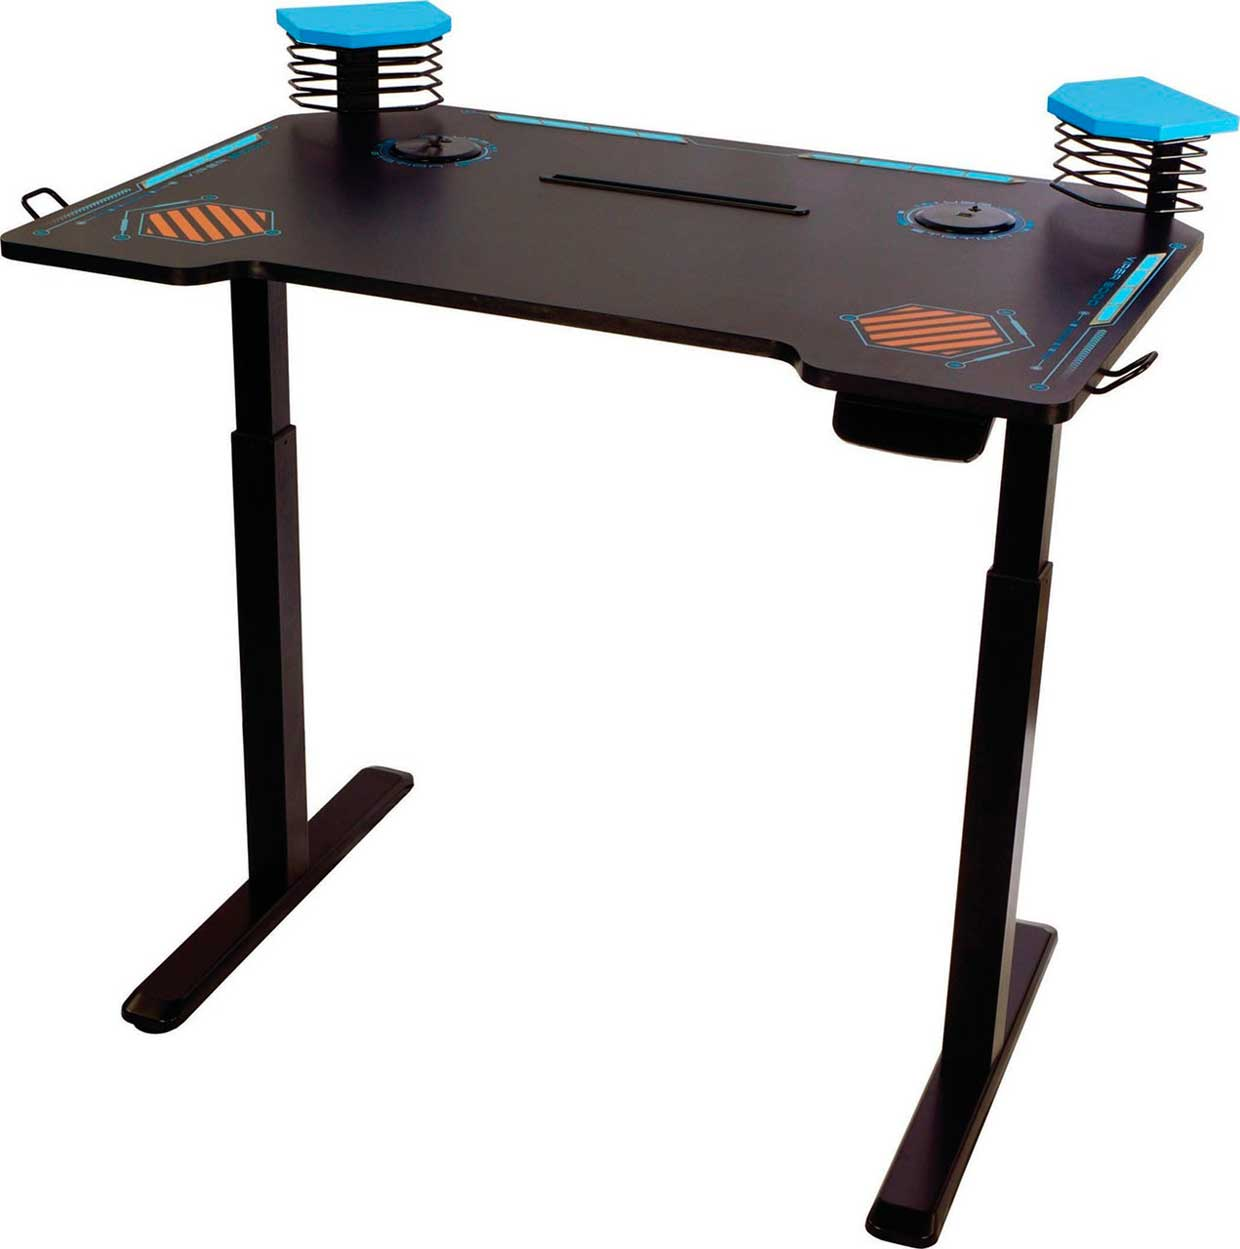 bureau gamer viper 3000 d atlantic ginjfo. Black Bedroom Furniture Sets. Home Design Ideas